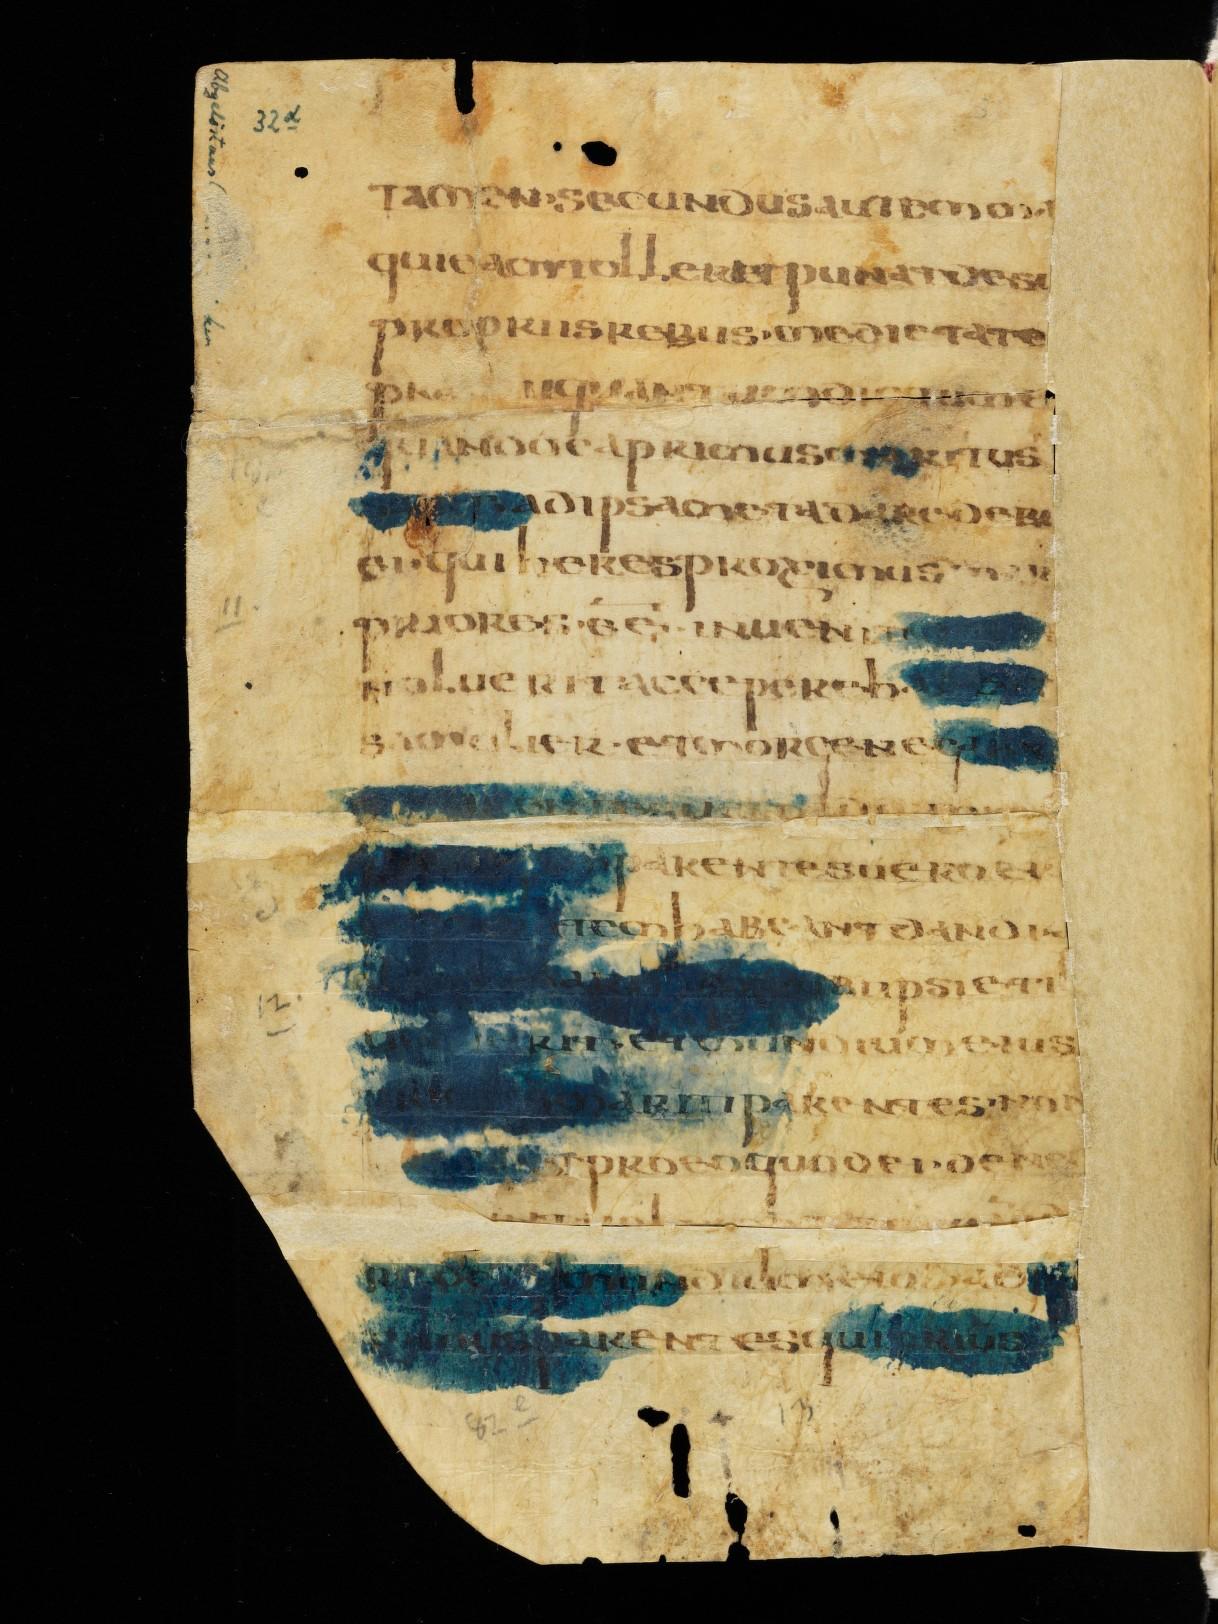 Cod. Sang. 730, p. 32d